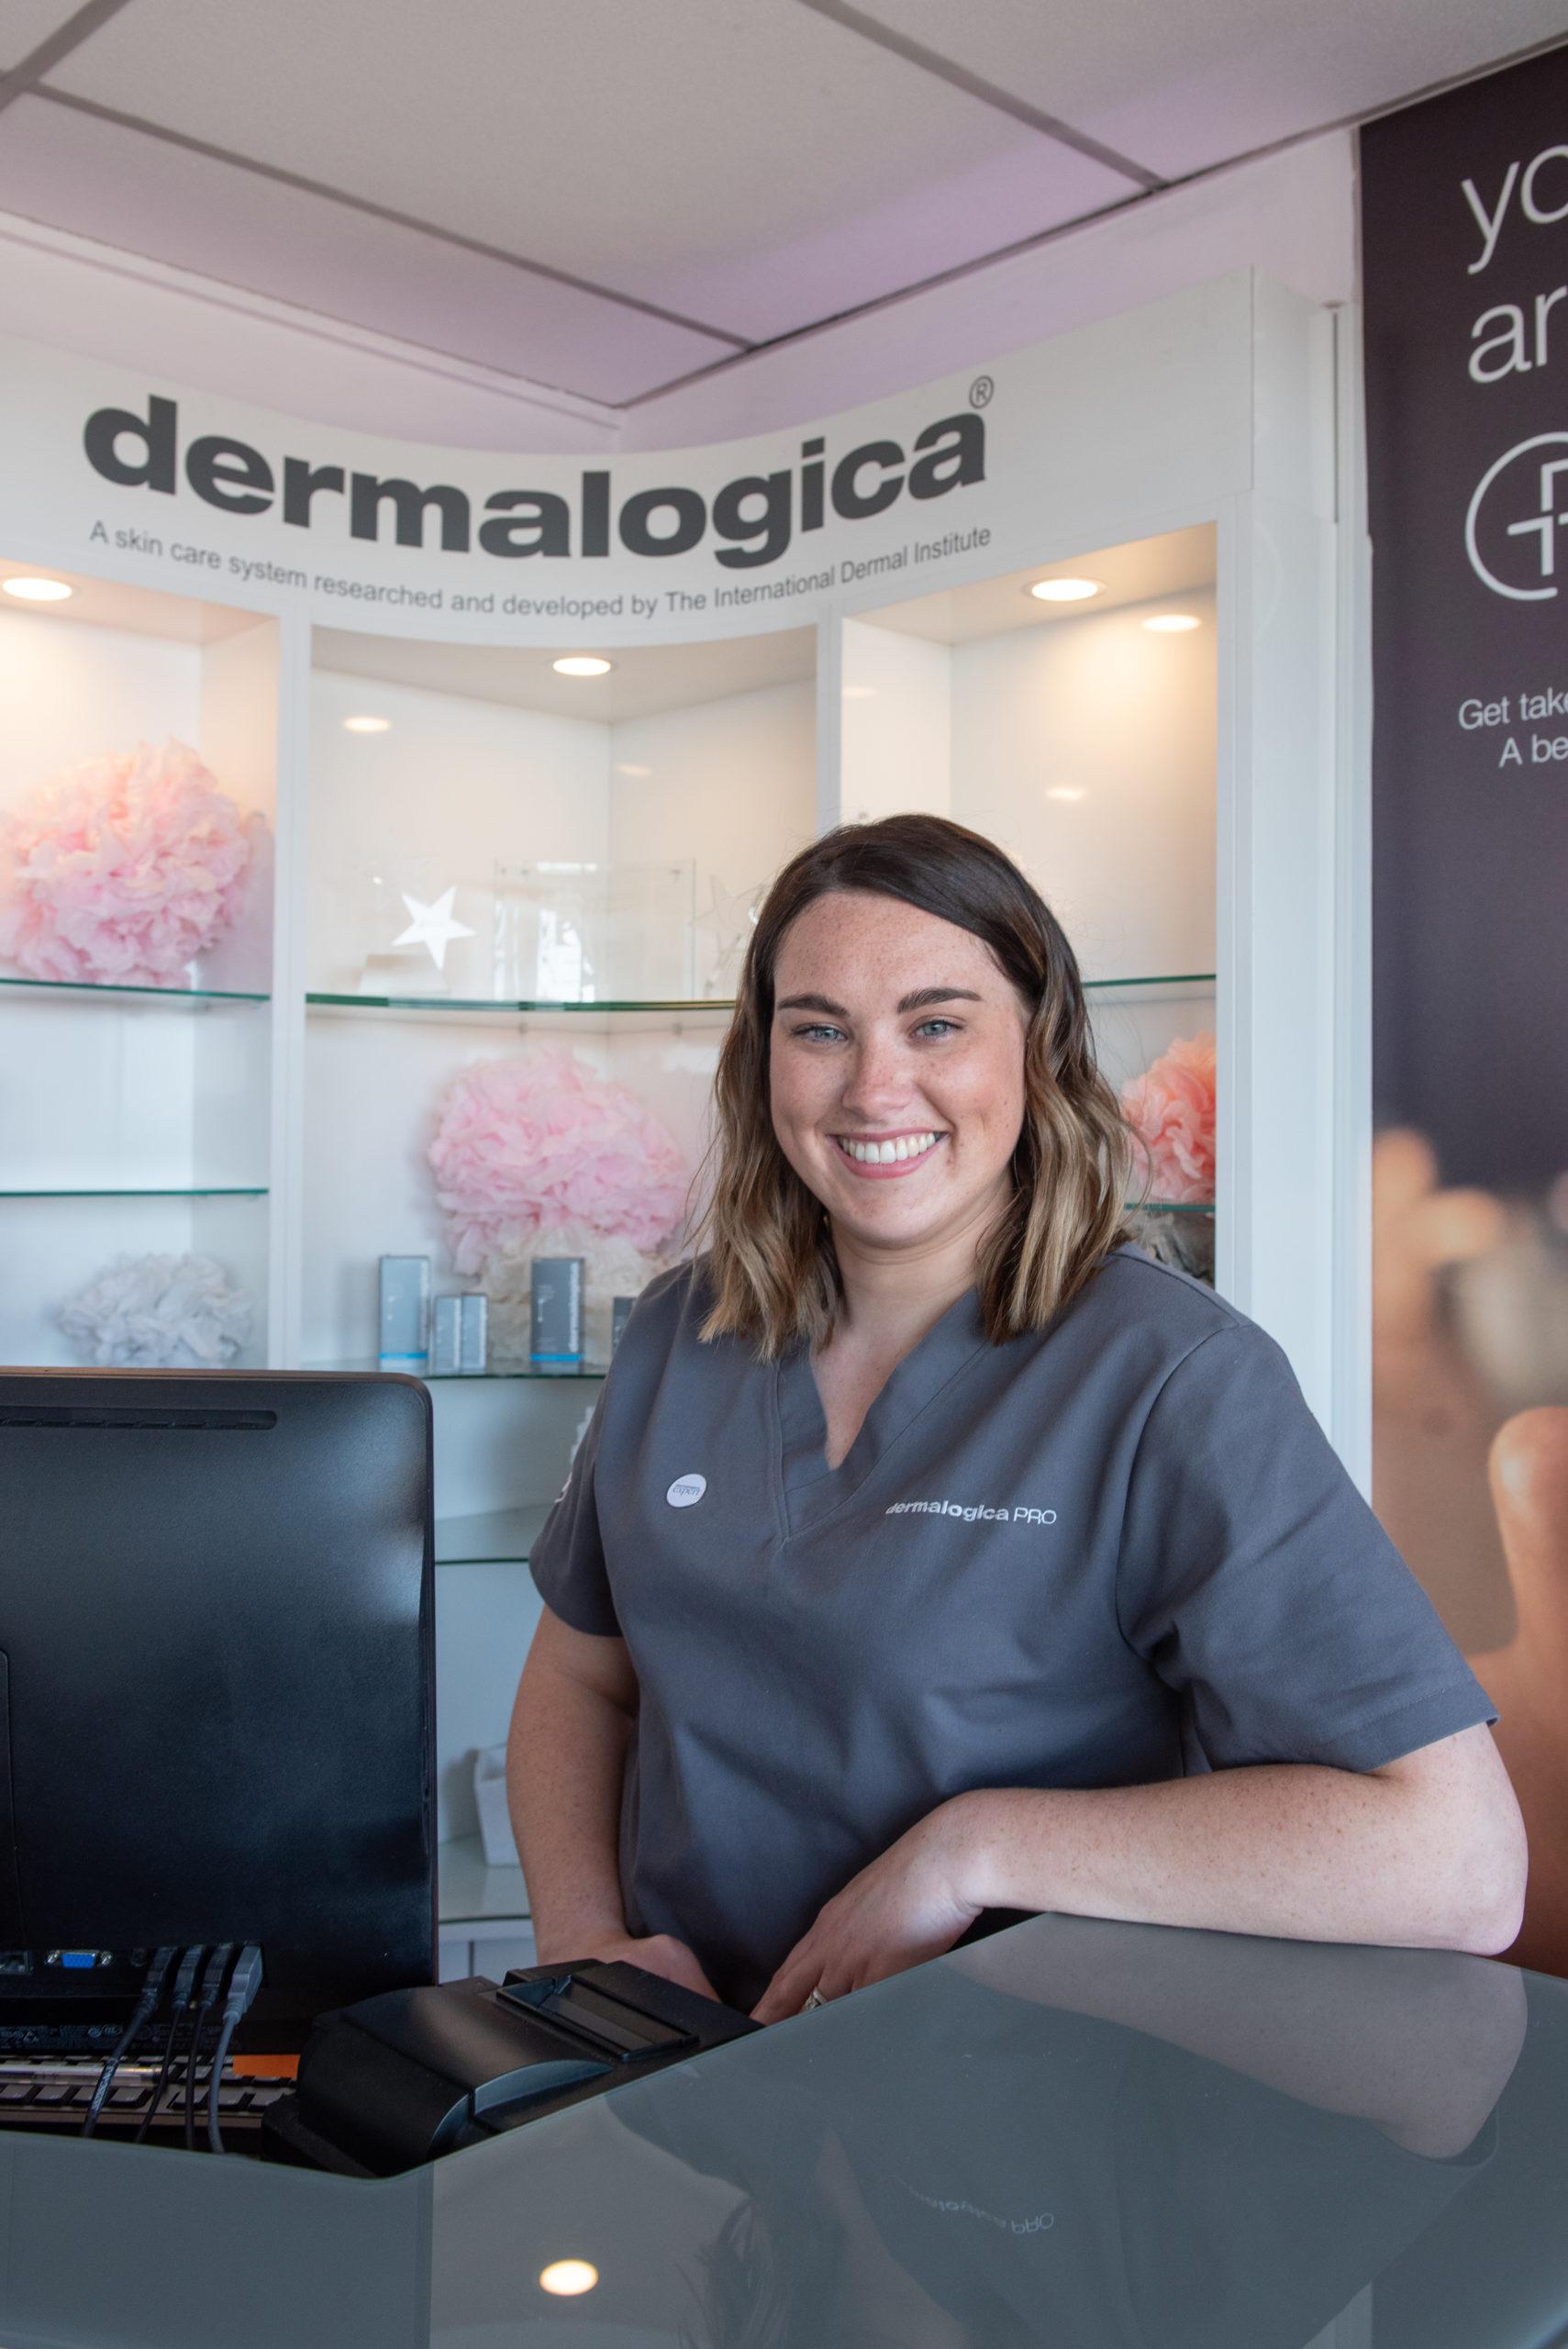 Professional skincare therapist moira